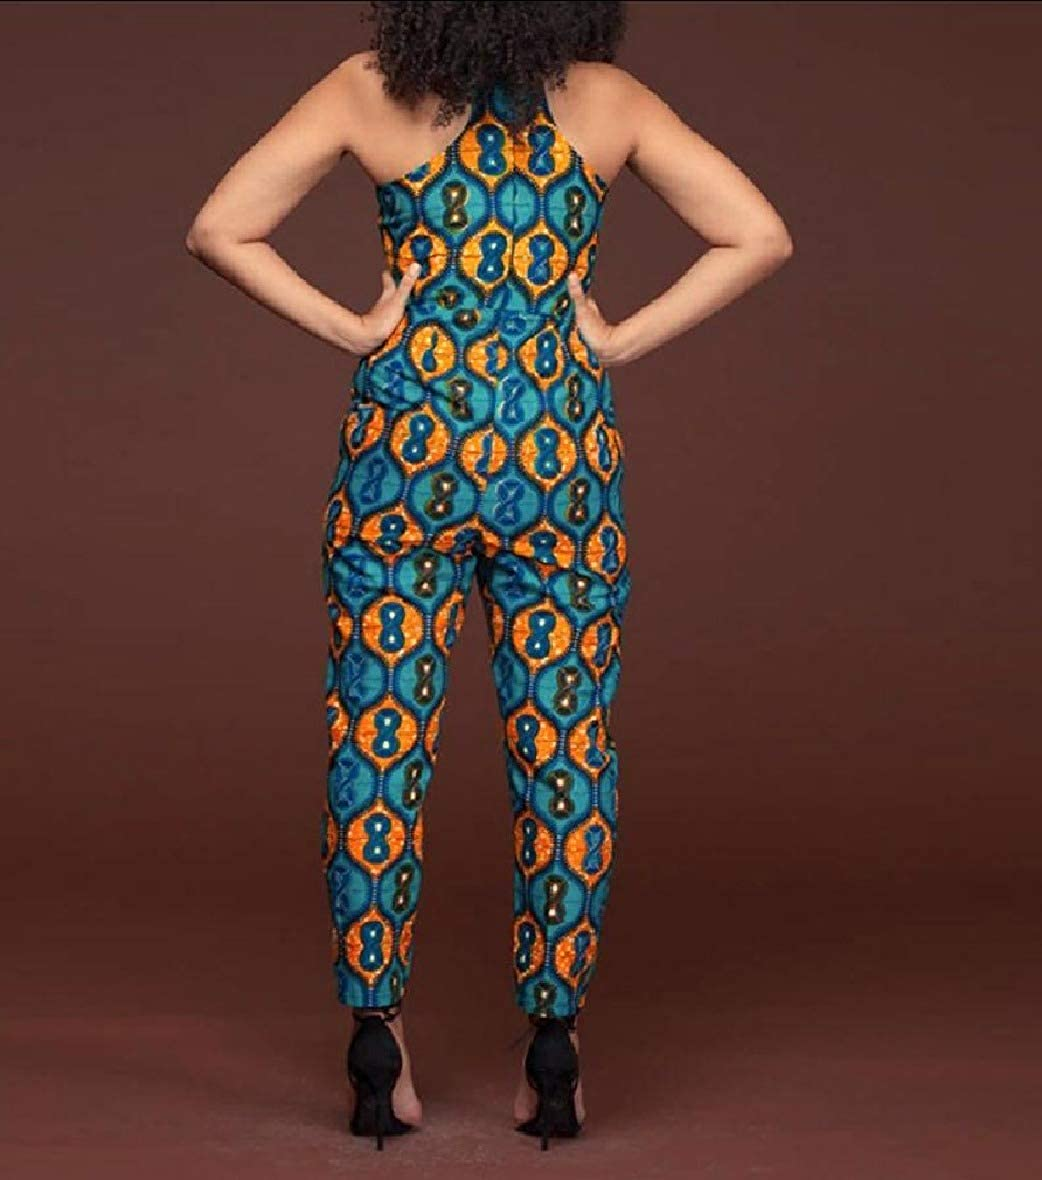 Sebaby Womens Sleeveless Fashional African Wax Fabric Romper Playsuit Jumpsuit